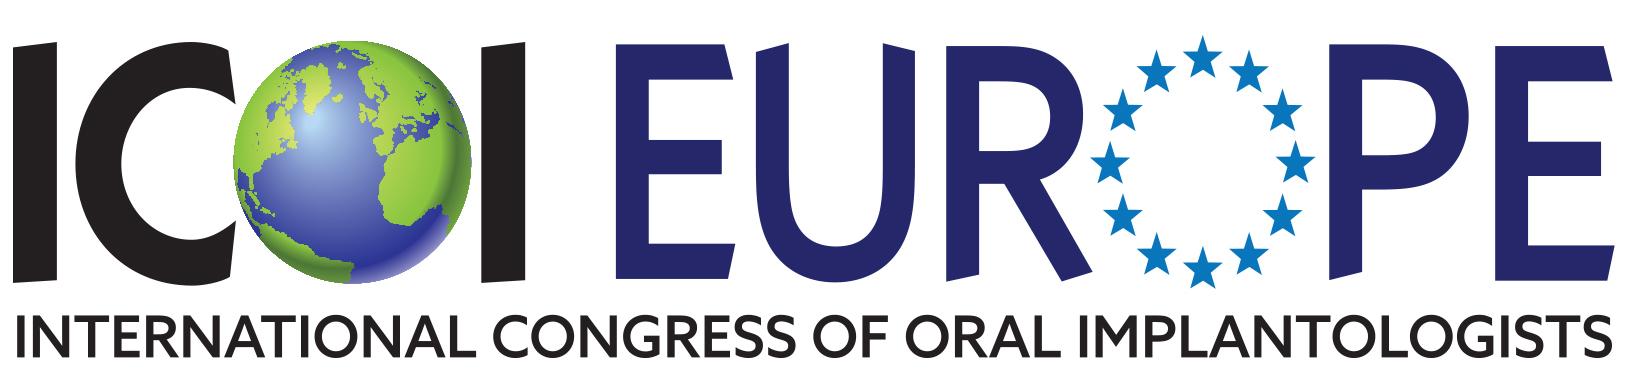 ICOI-Europe-Logo-Horiz-DK-BLUE